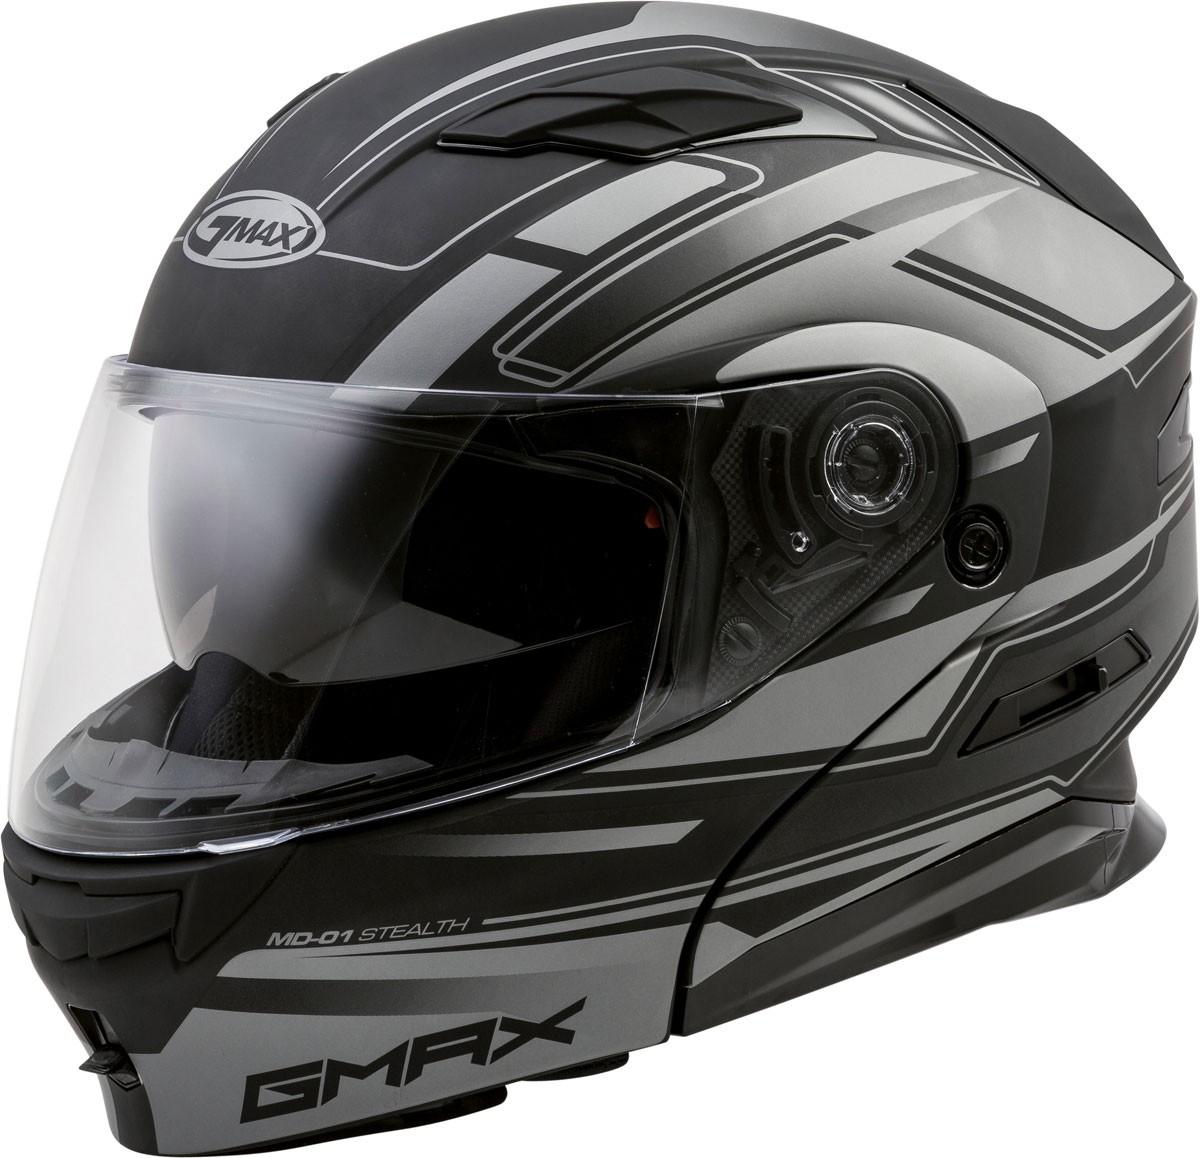 GMAX MD-01 STEALTH Modular Flip-Up Motorcycle Helmet w Drop-Down Sun Visor  (Matte Black Silver) 4139eb9f2de